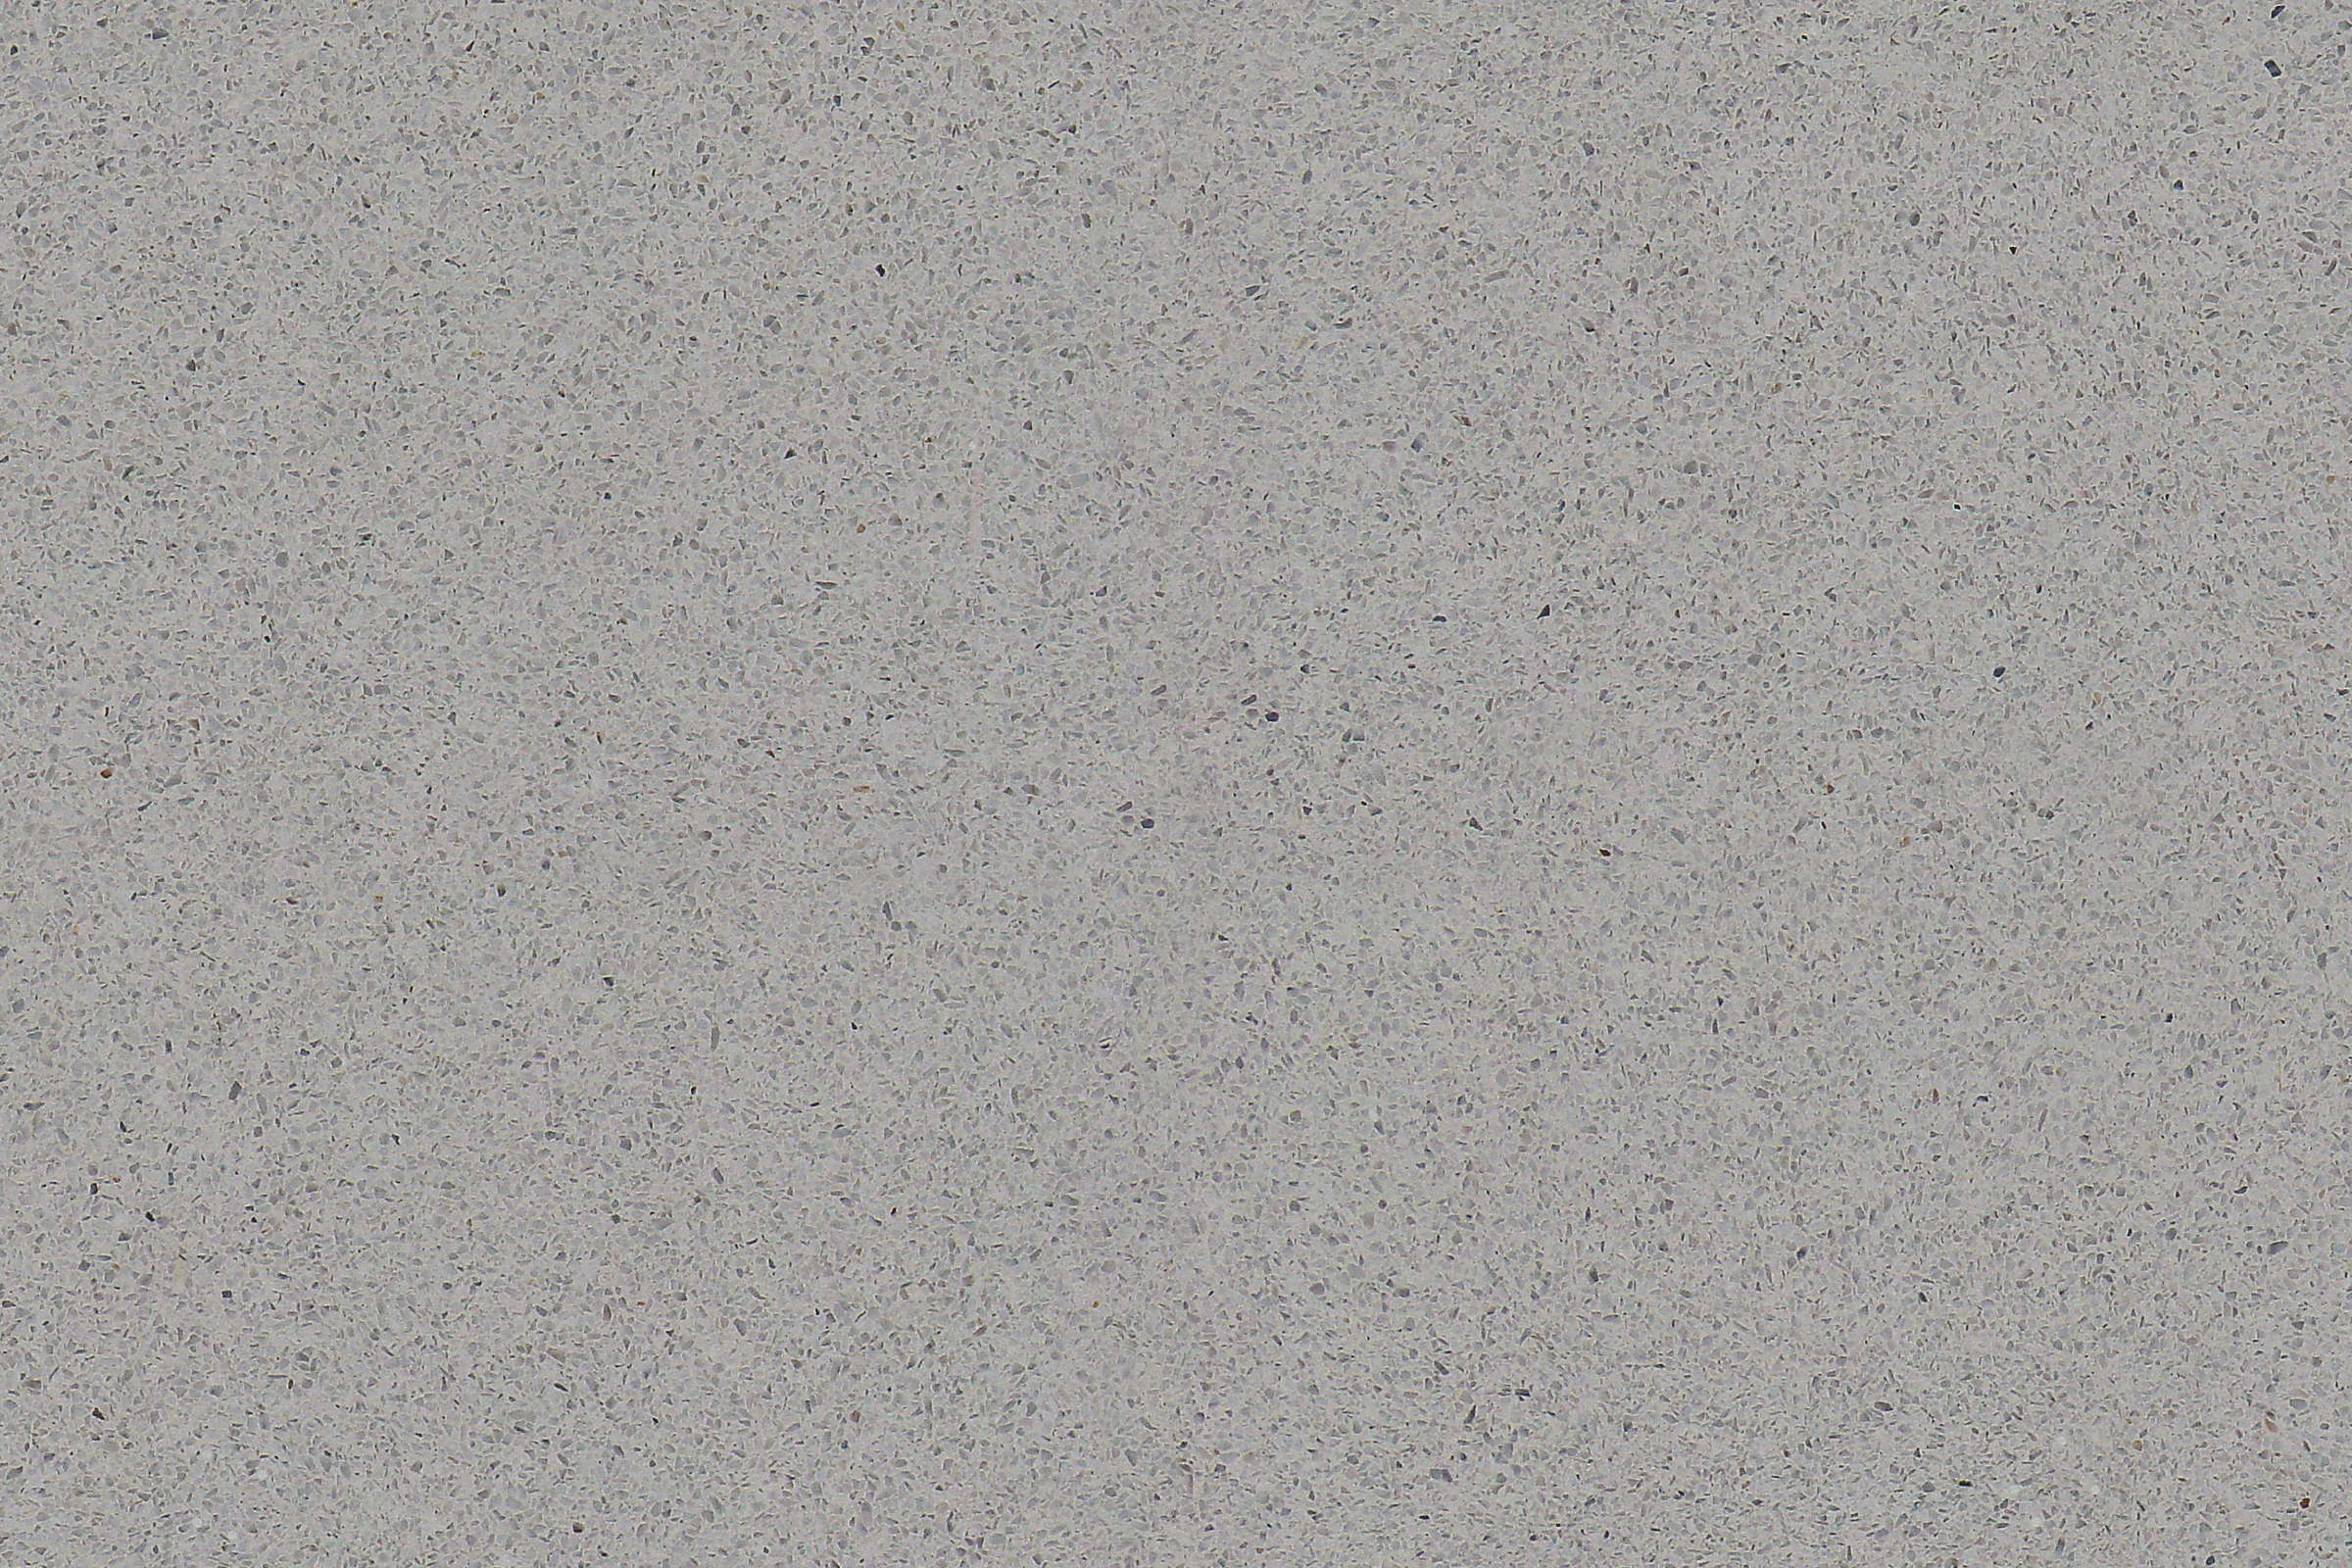 Terrazzo Tiling Texture